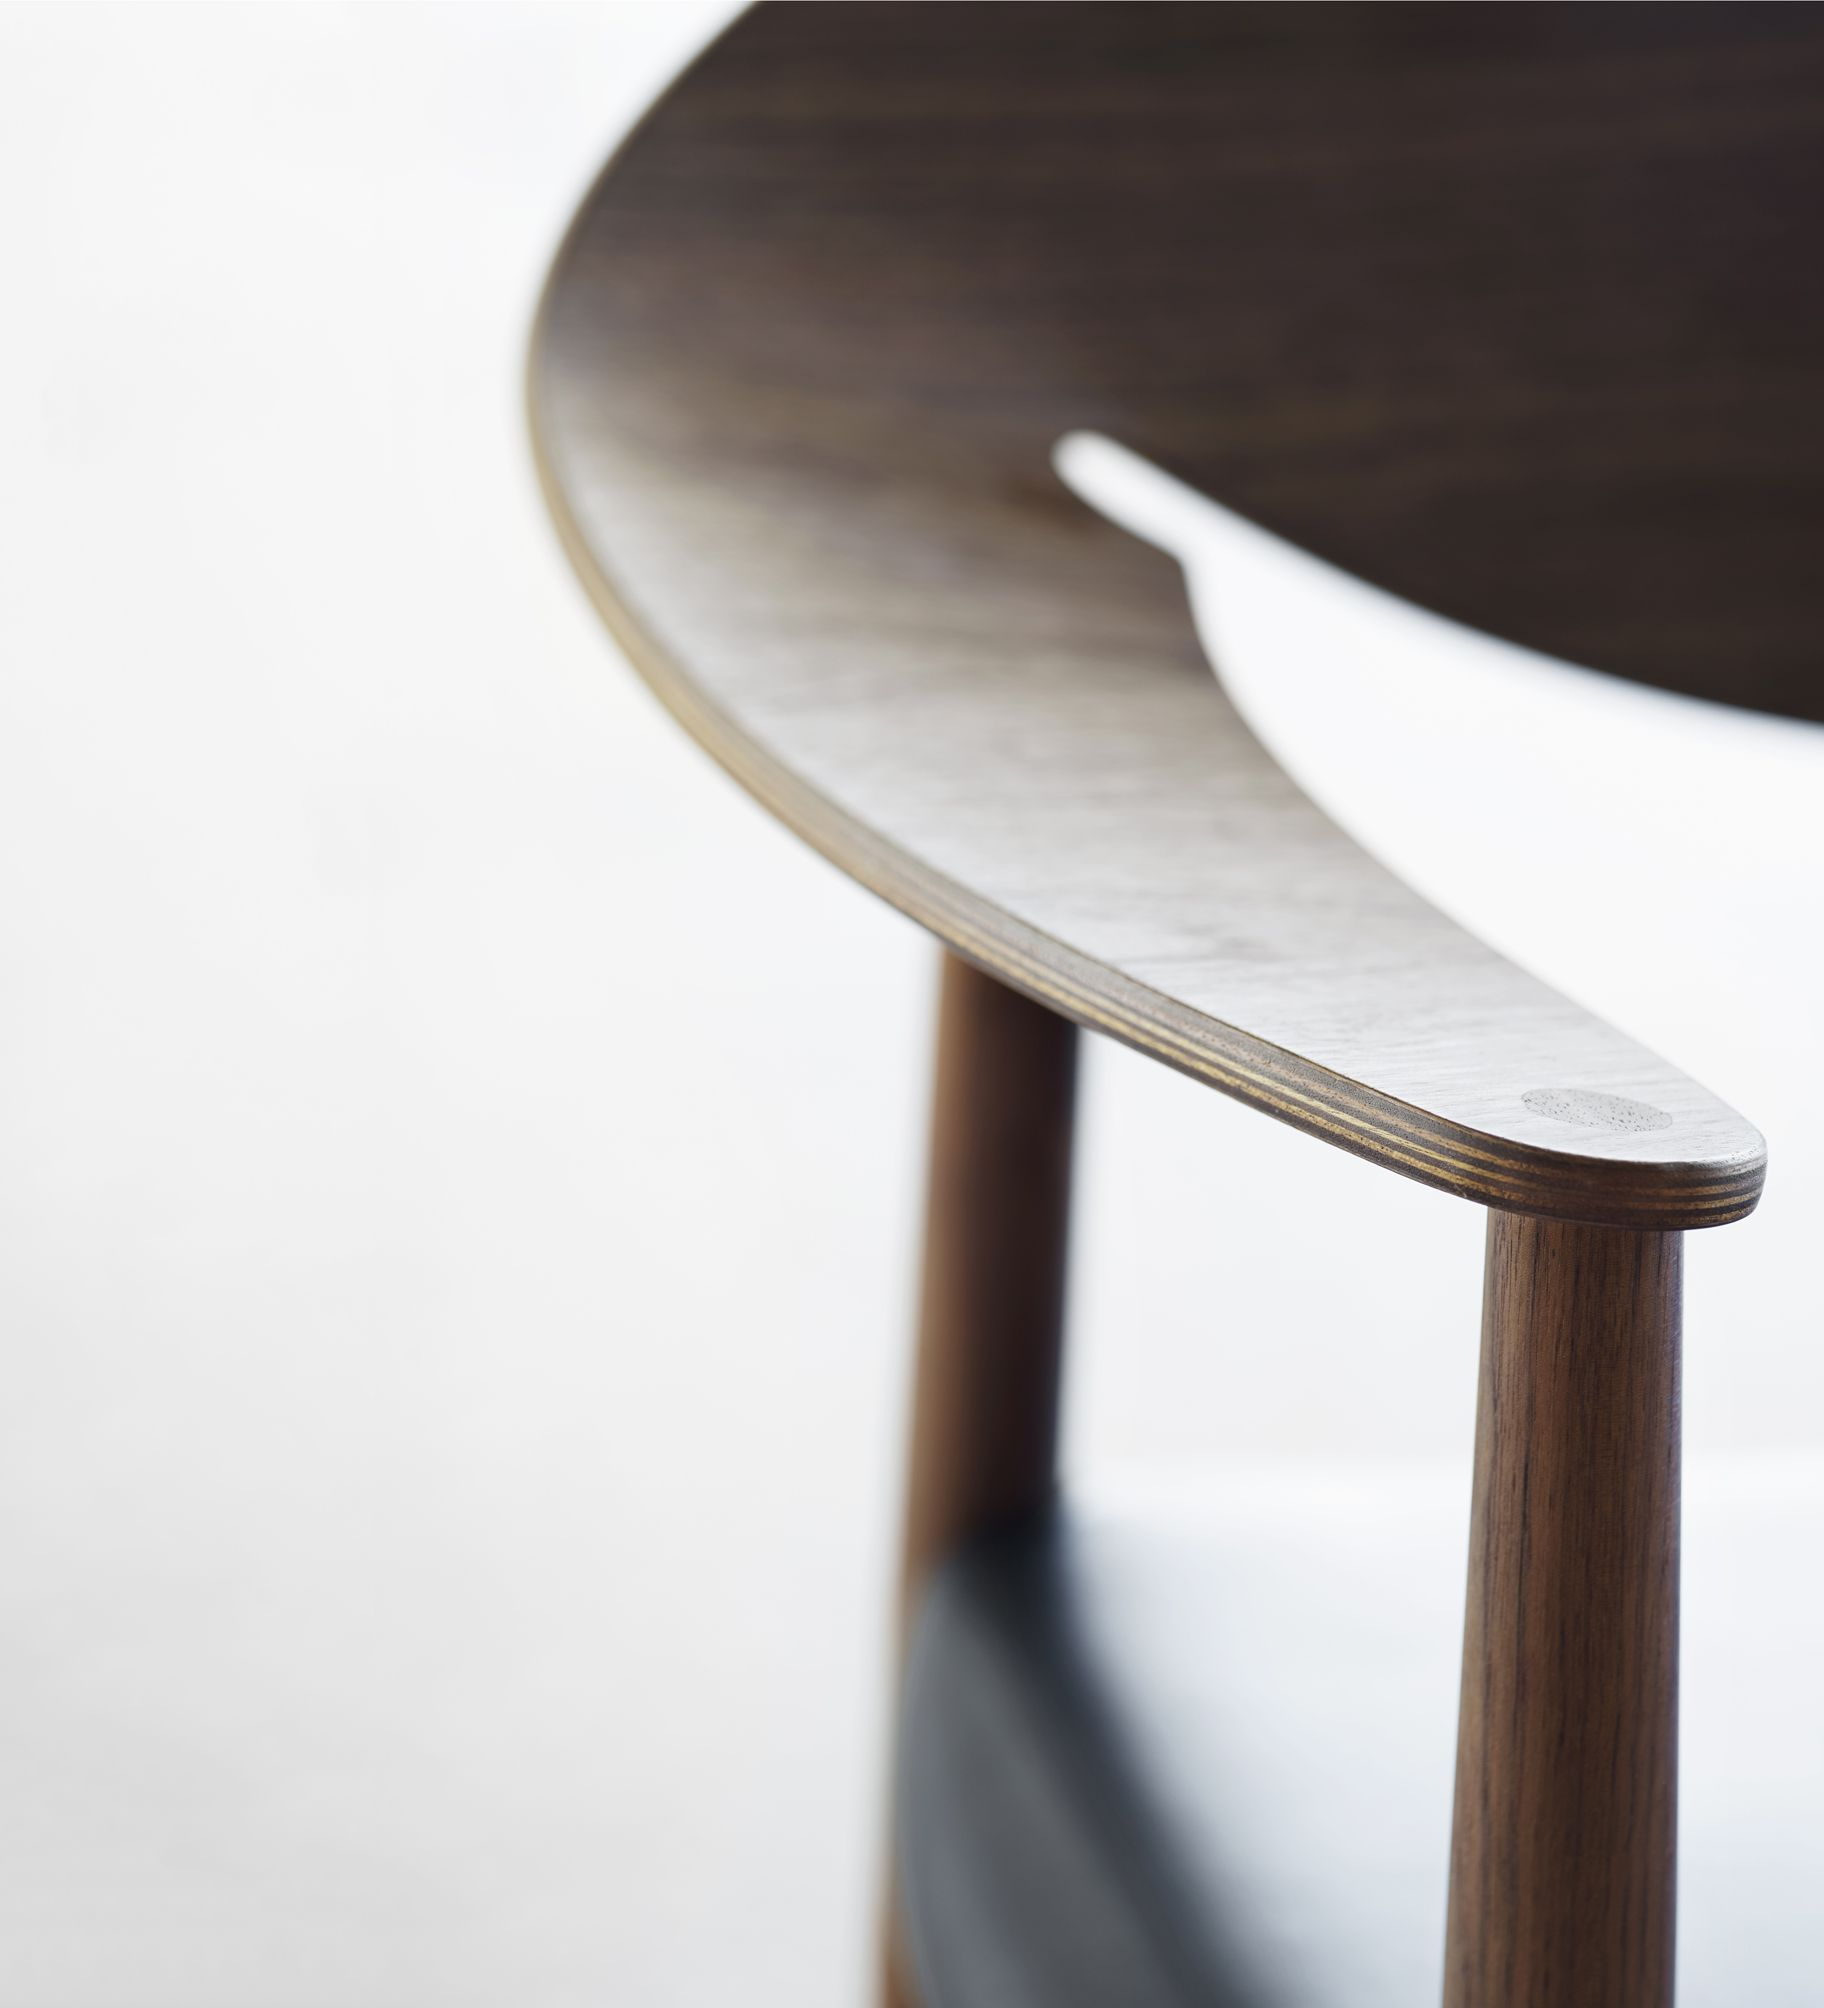 Carl Hansen & Søn - LM92 | Metropolitan - Detail - Designed by Ejner Larsen & Aksel Bender Madsen - http://www.carlhansen.com